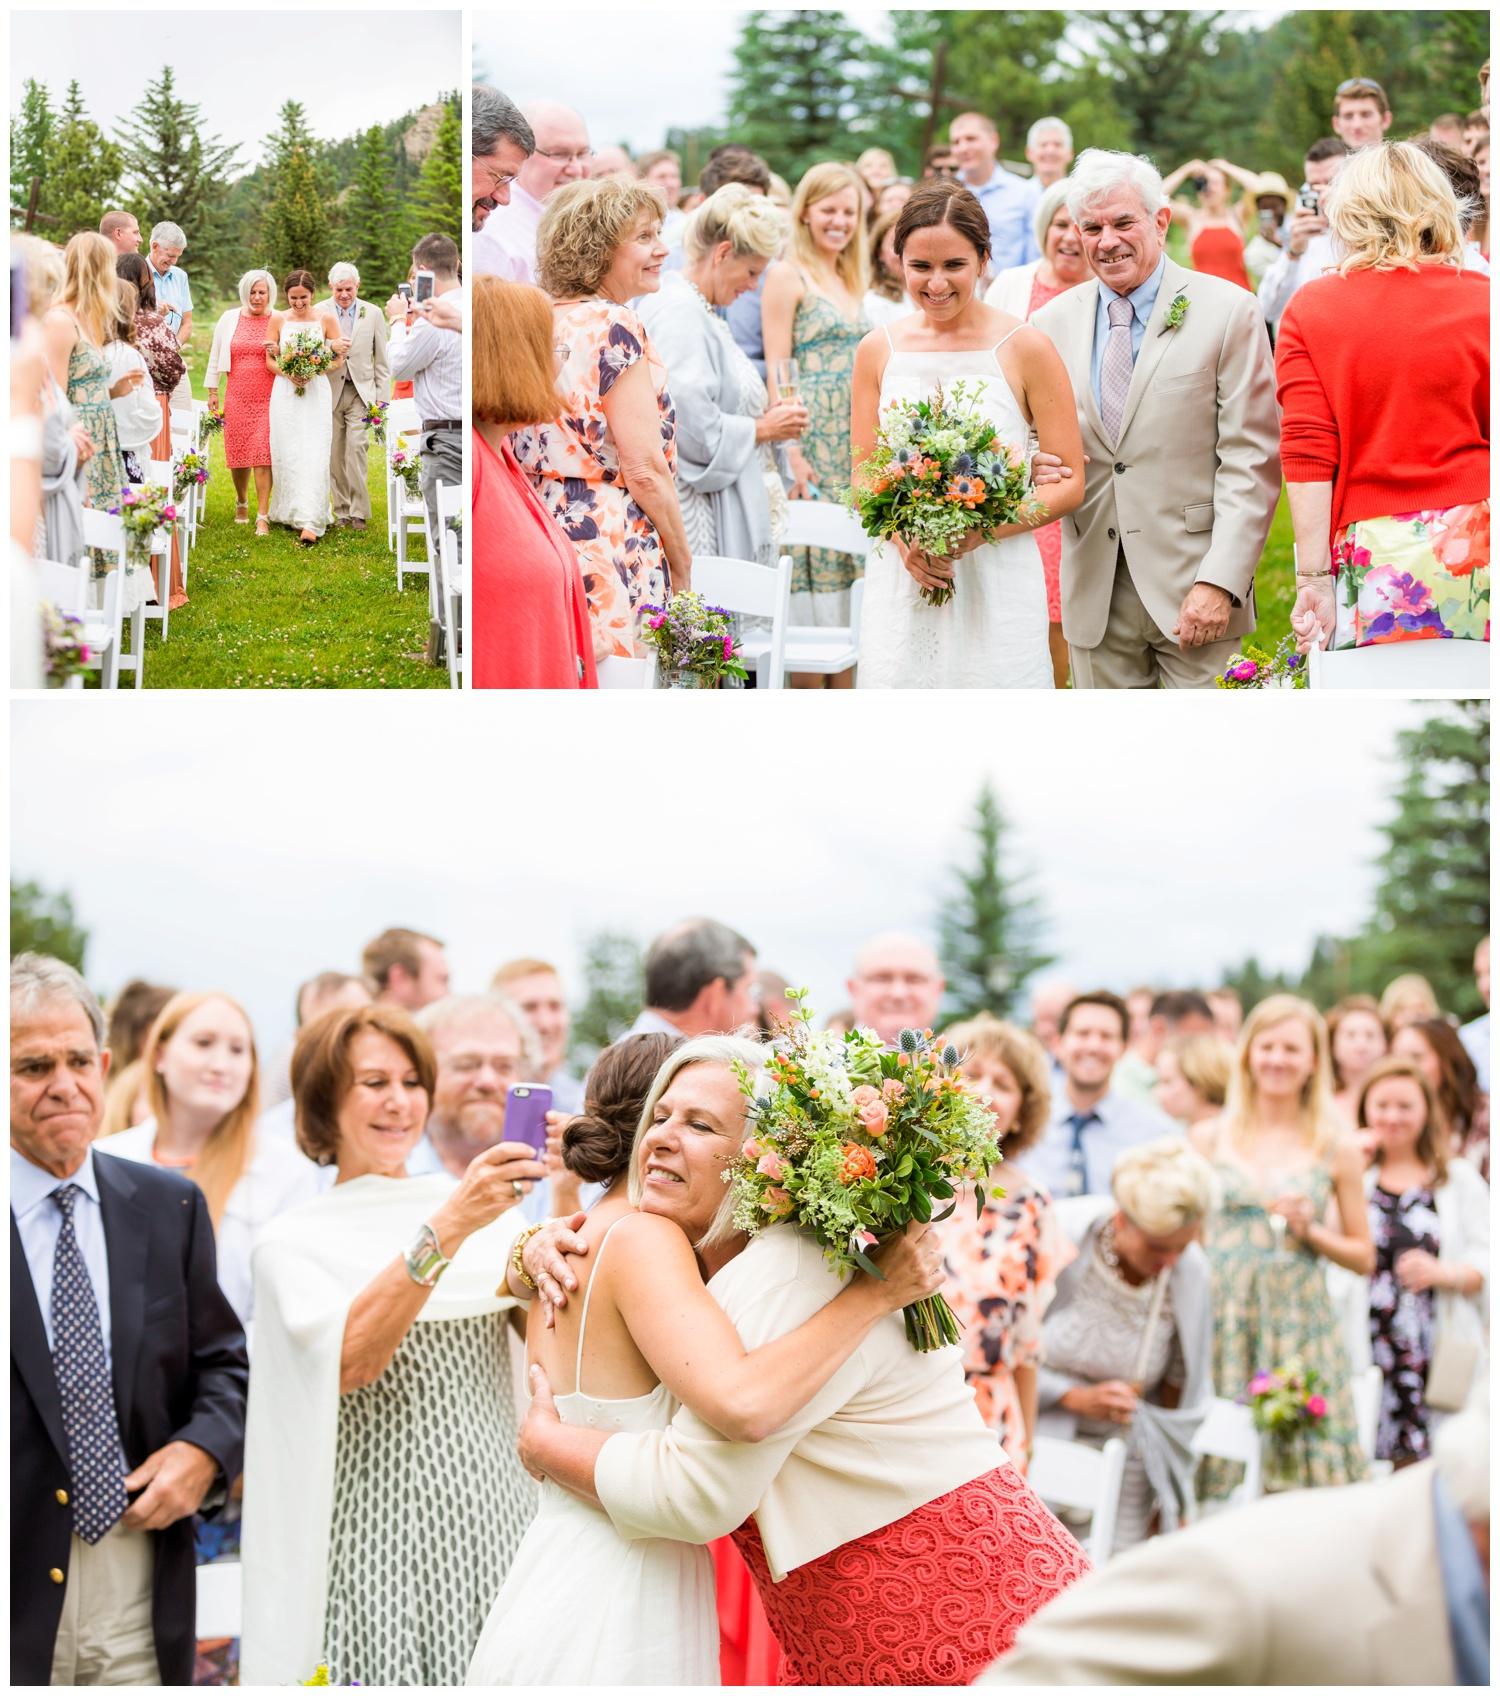 evergreen wedding photography012.jpg